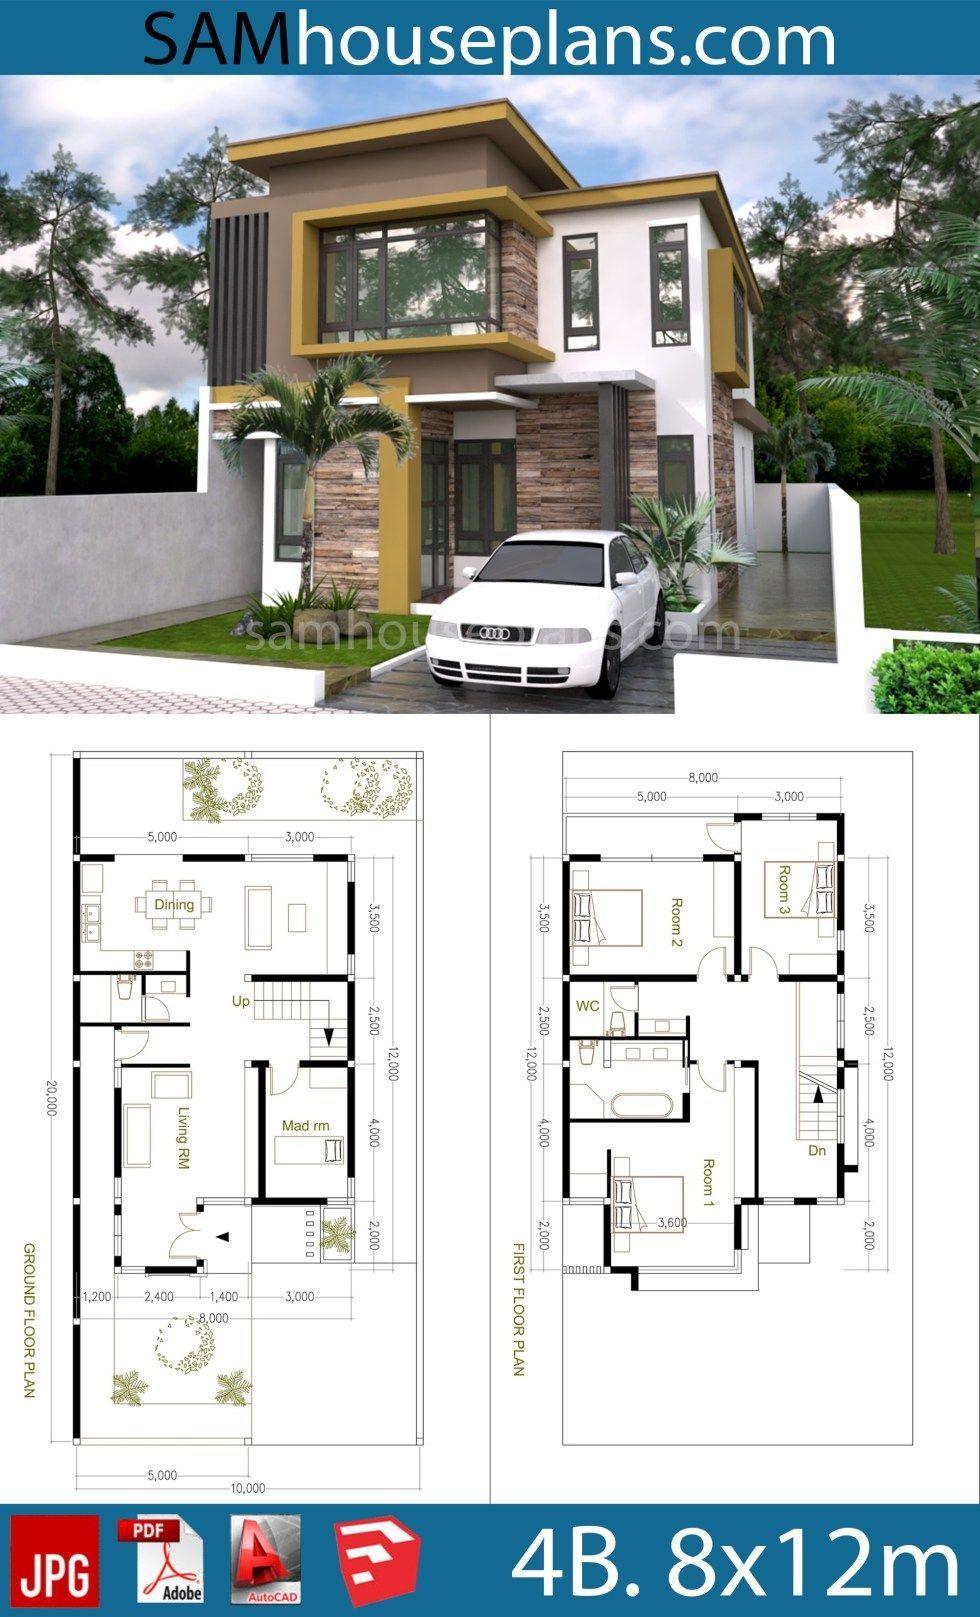 House Plans 8x12m With 4 Bedrooms Sam House Plans Bedroomdesignplan Arsitektur Modern Arsitektur Rumah Indah